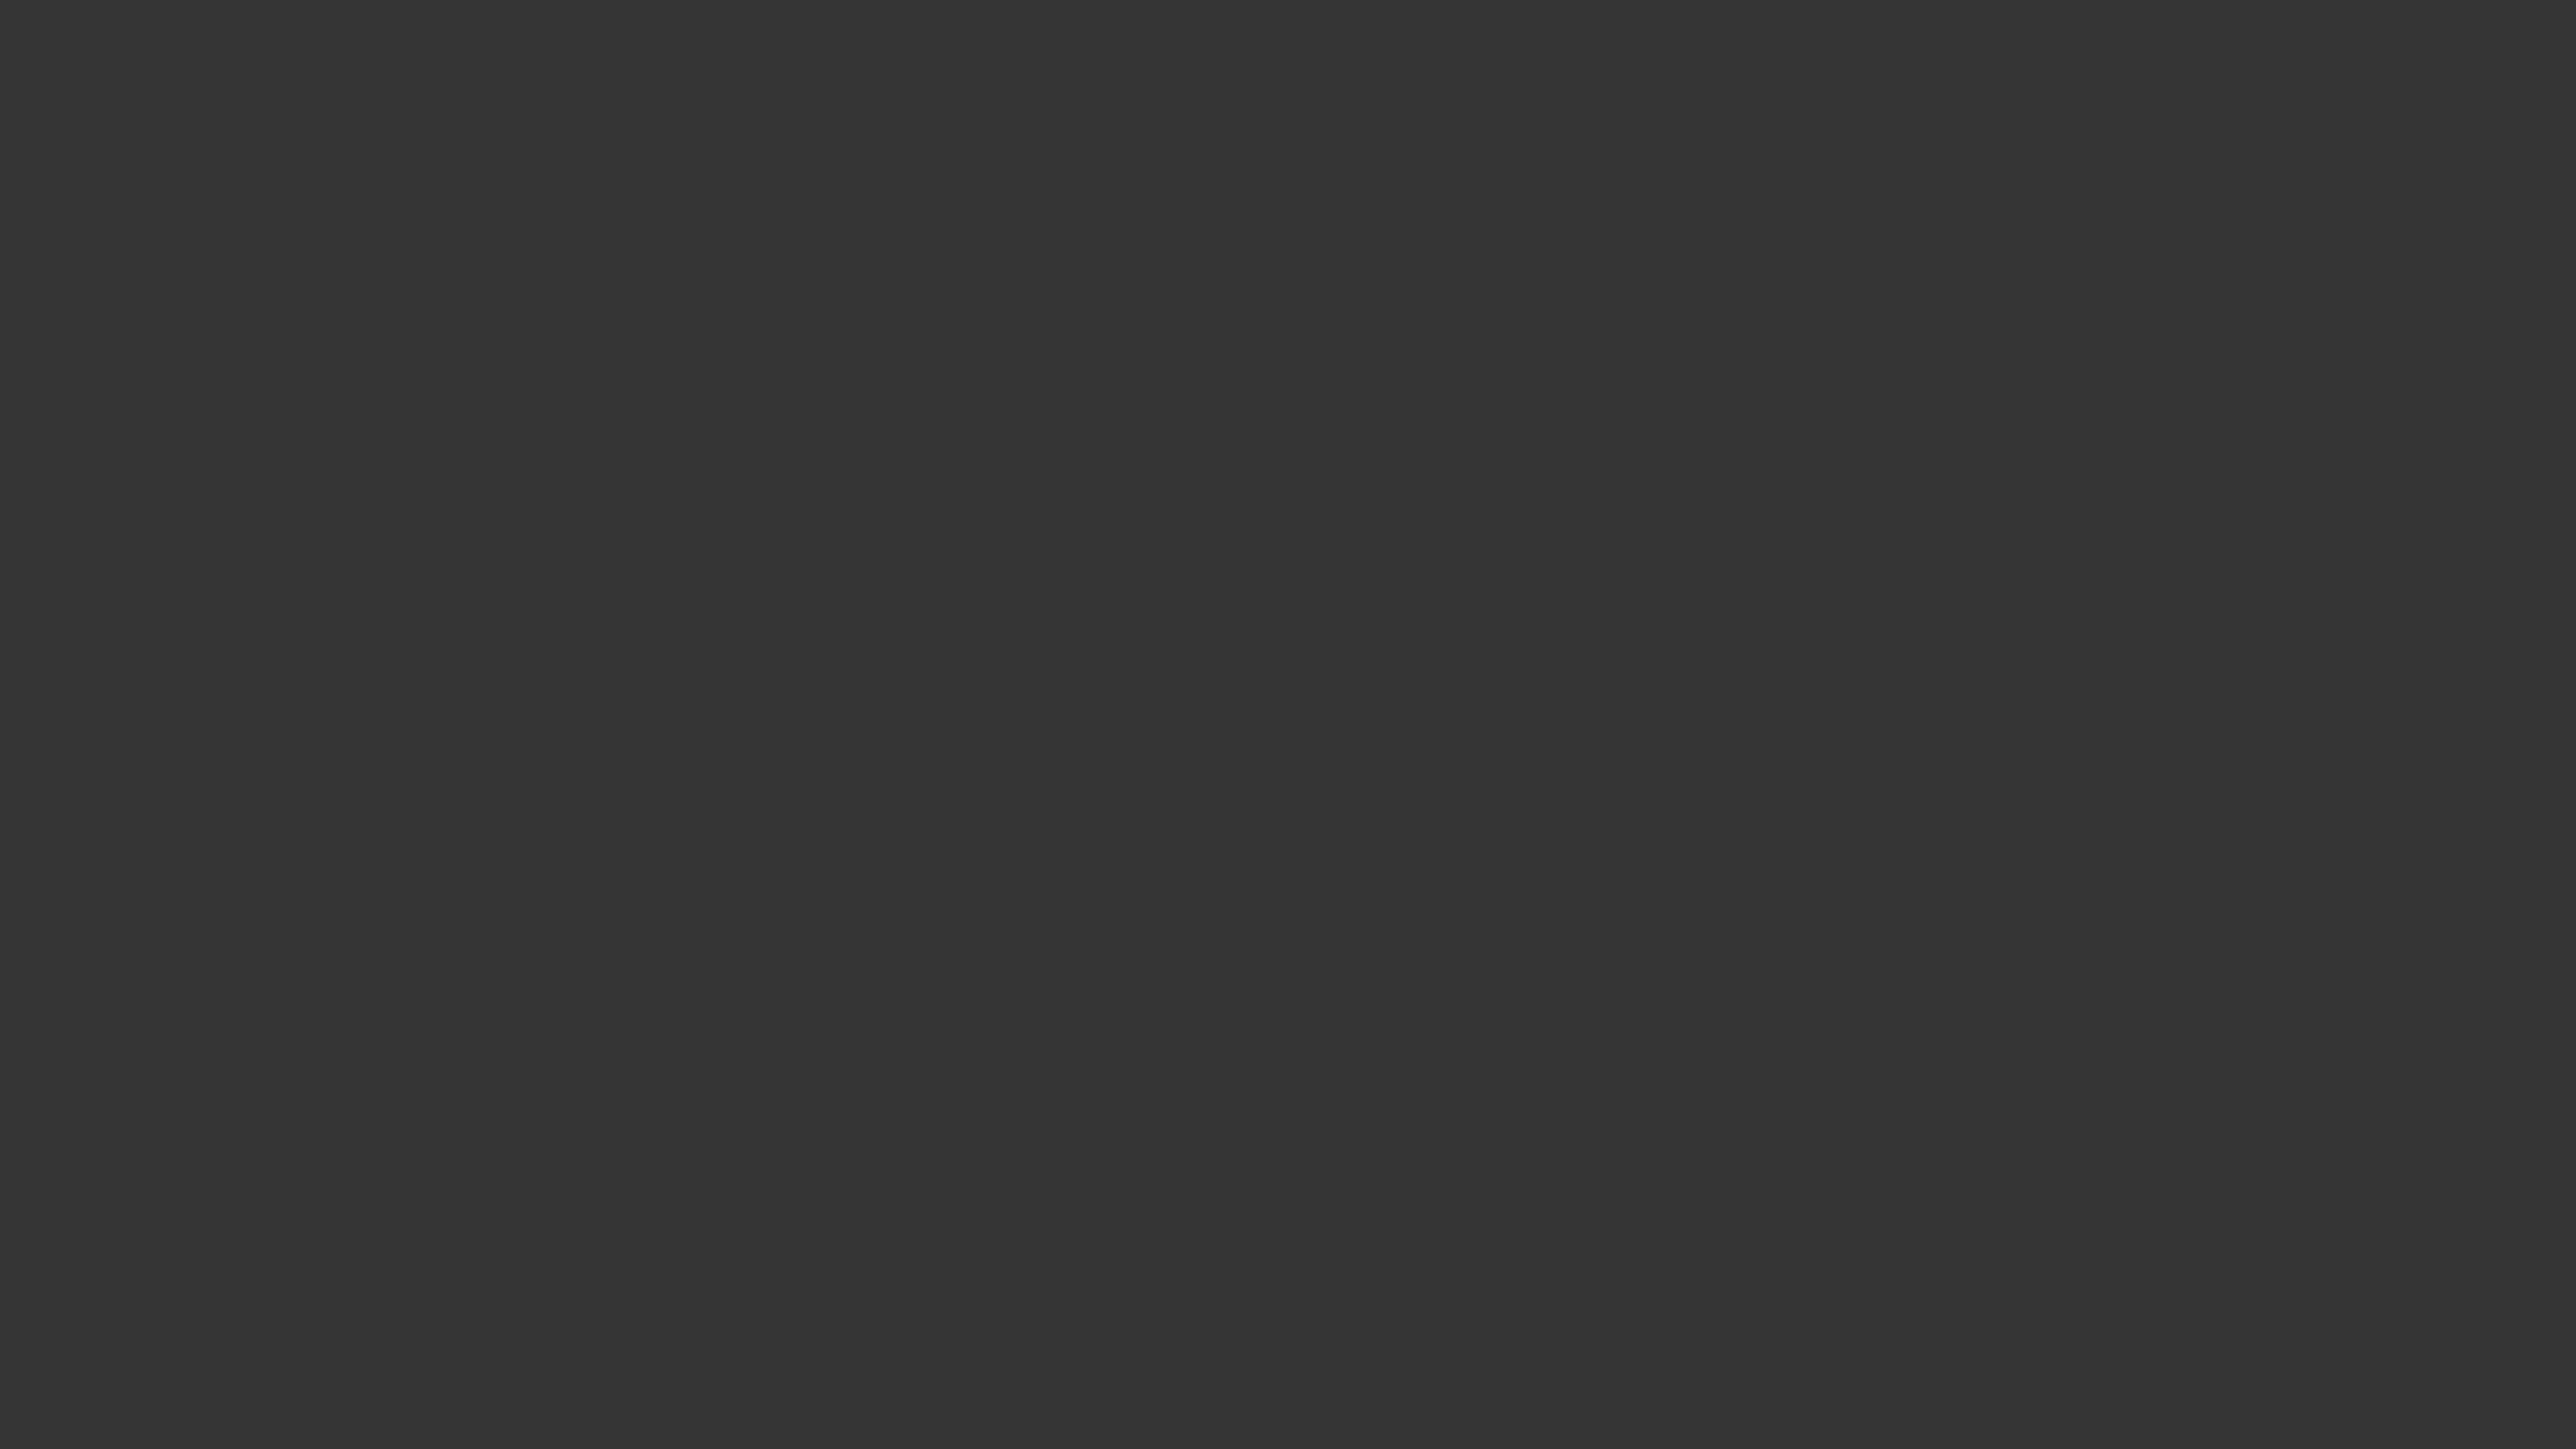 5120x2880 Jet Solid Color Background